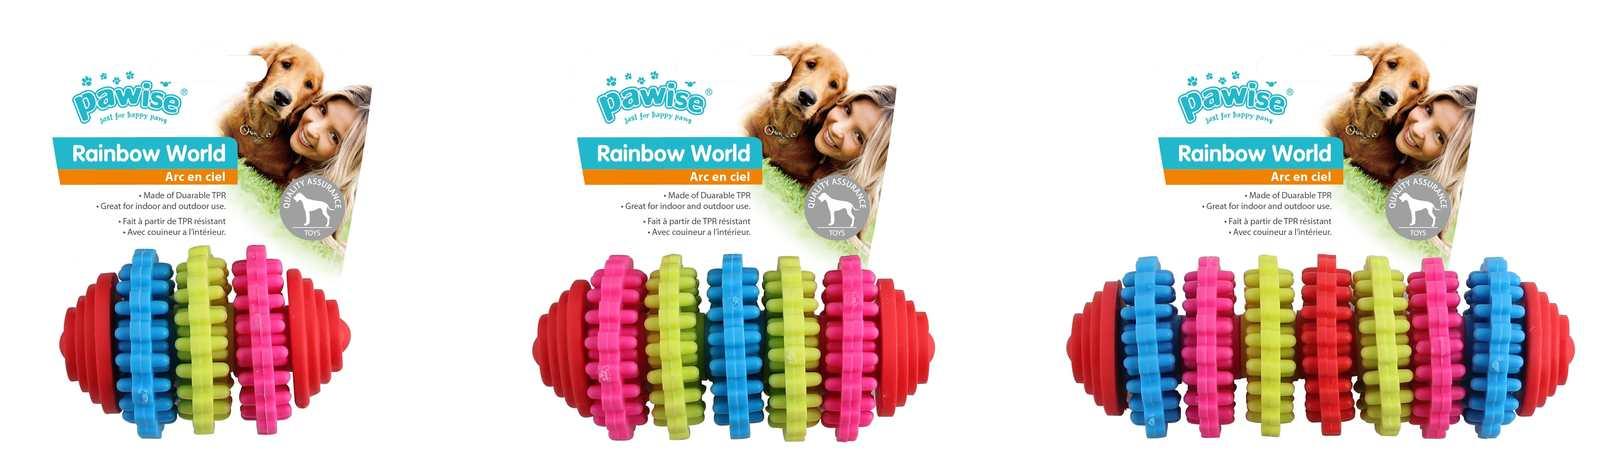 Pawise: Rainbow World - Gear Small image